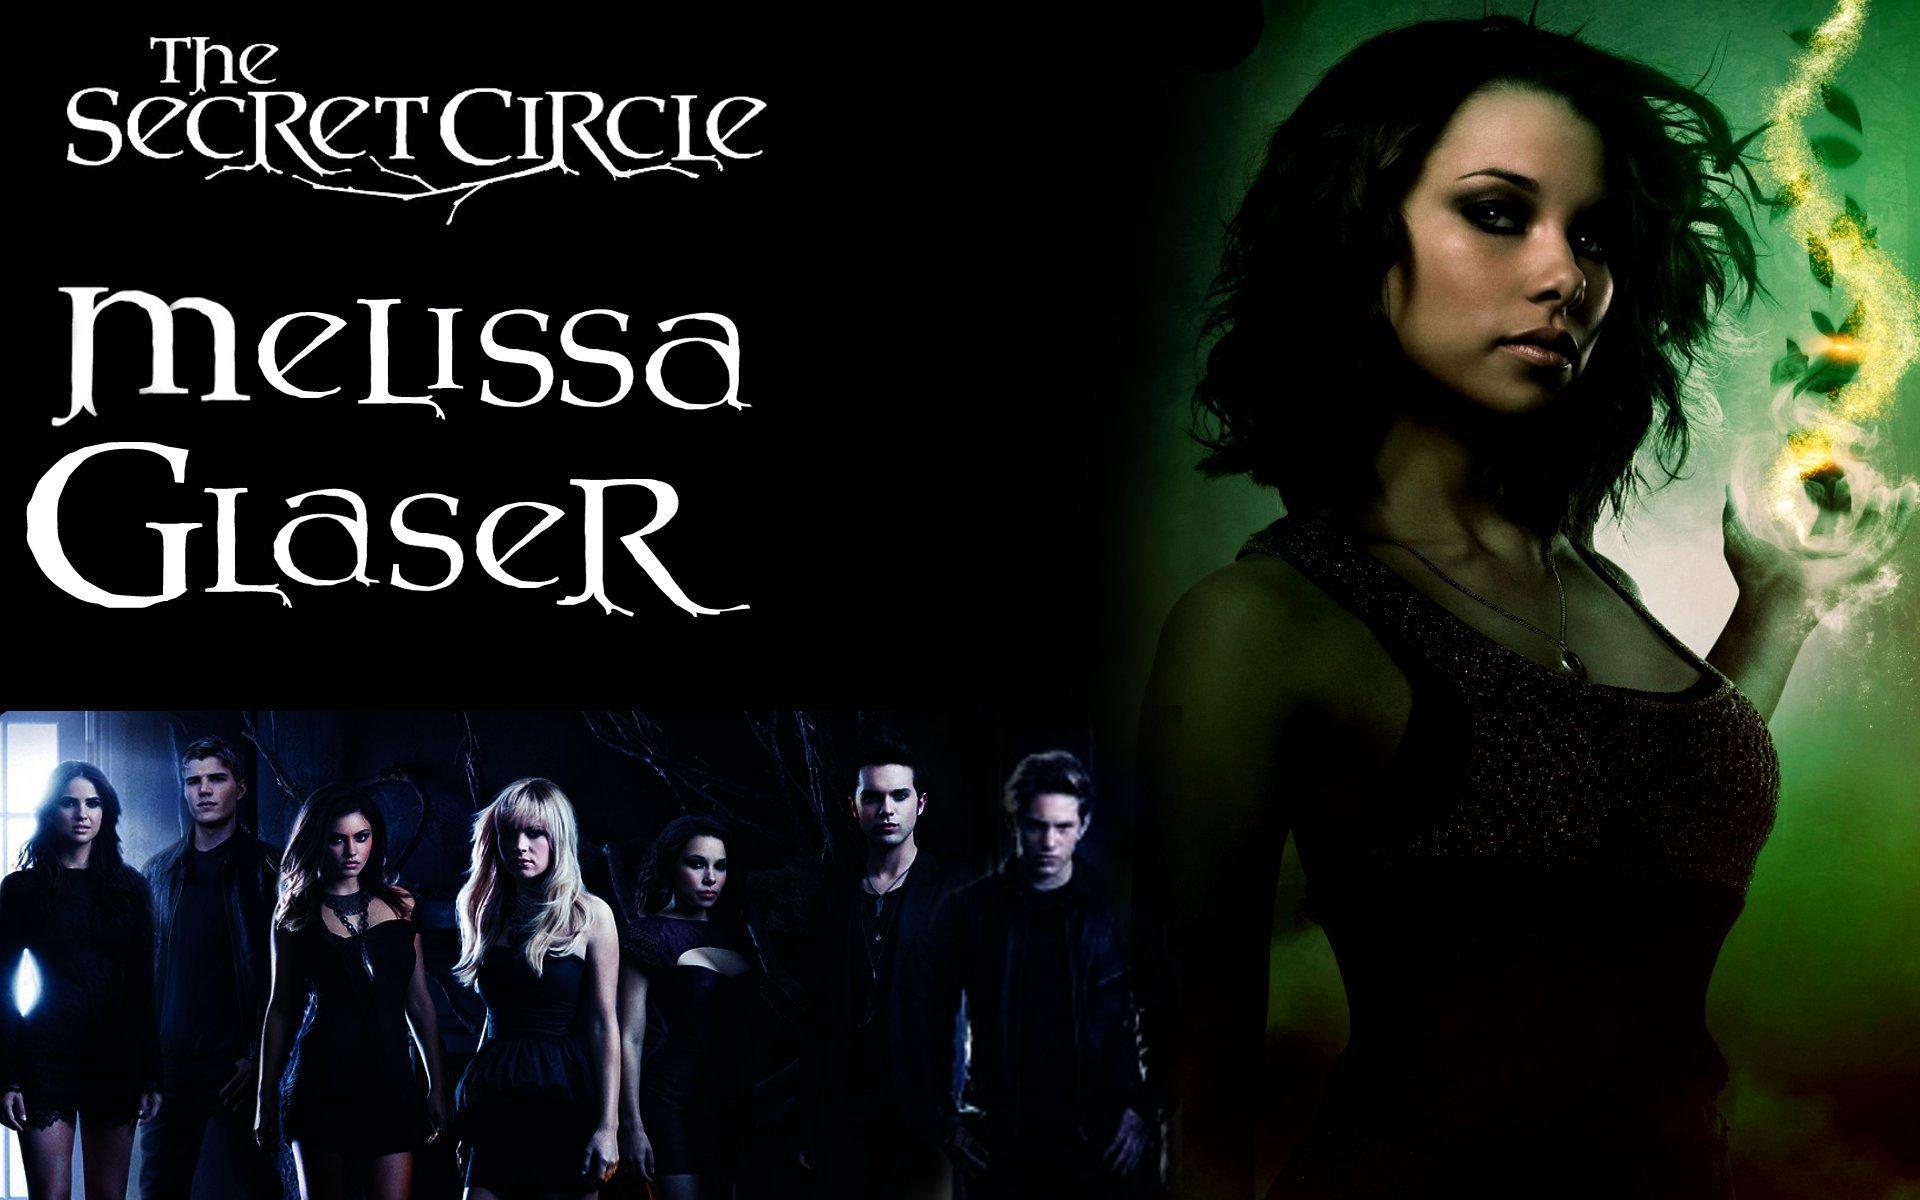 The secret circle cast diana